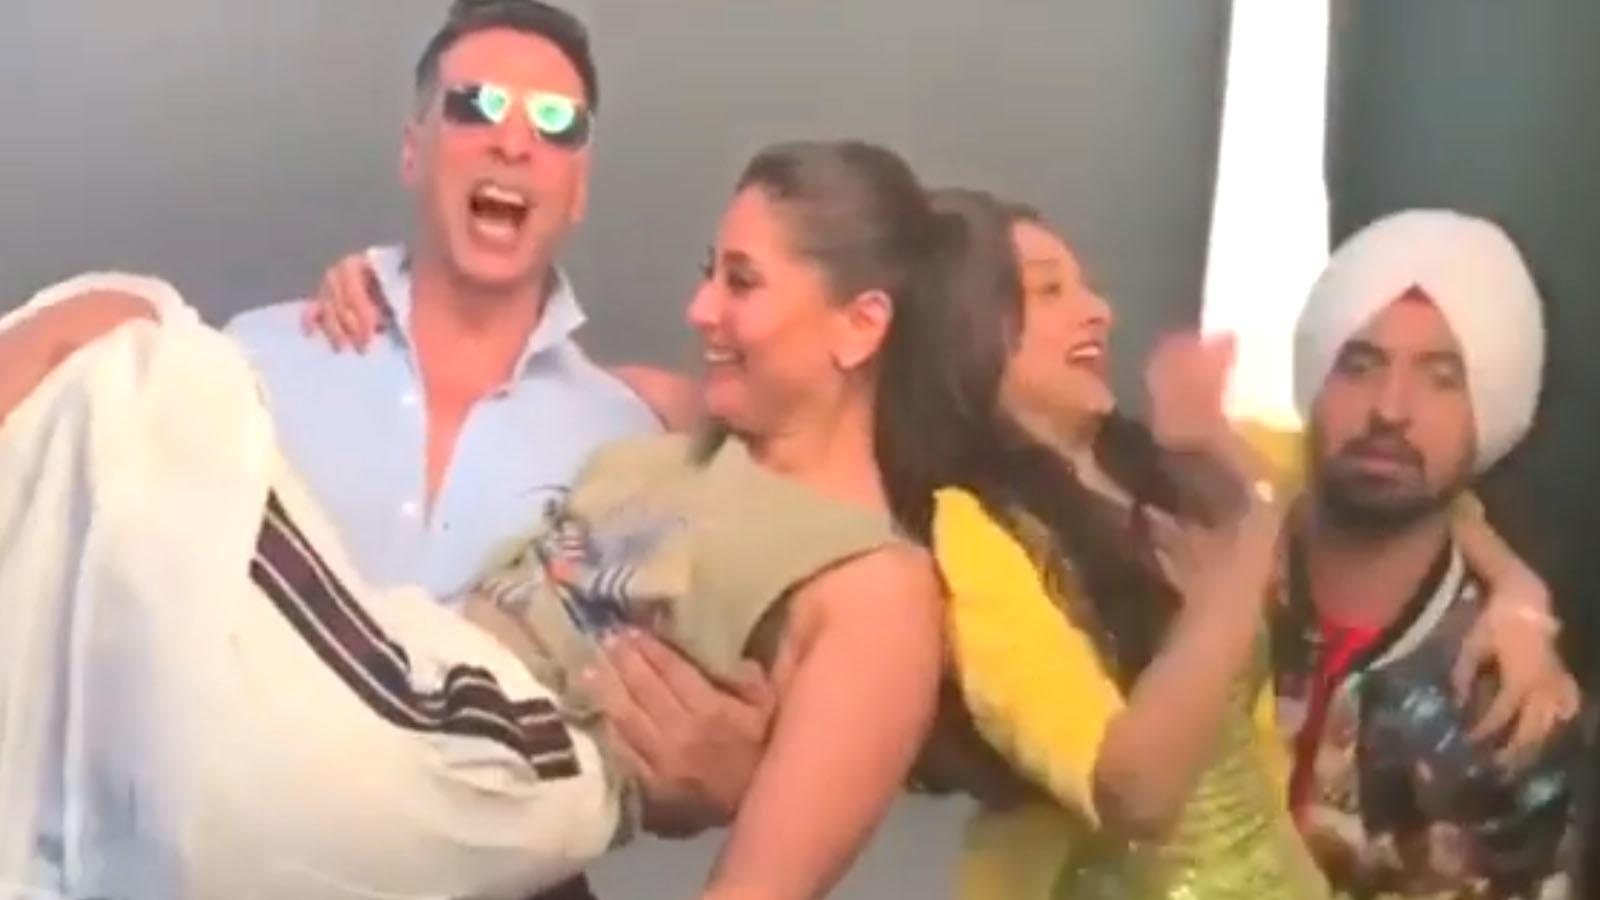 After Ayushmann Khurrana, now Kareena Kapoor, Kiara Advani, Diljit Dosanjh take up #TheBalaChallenge, video goes viral